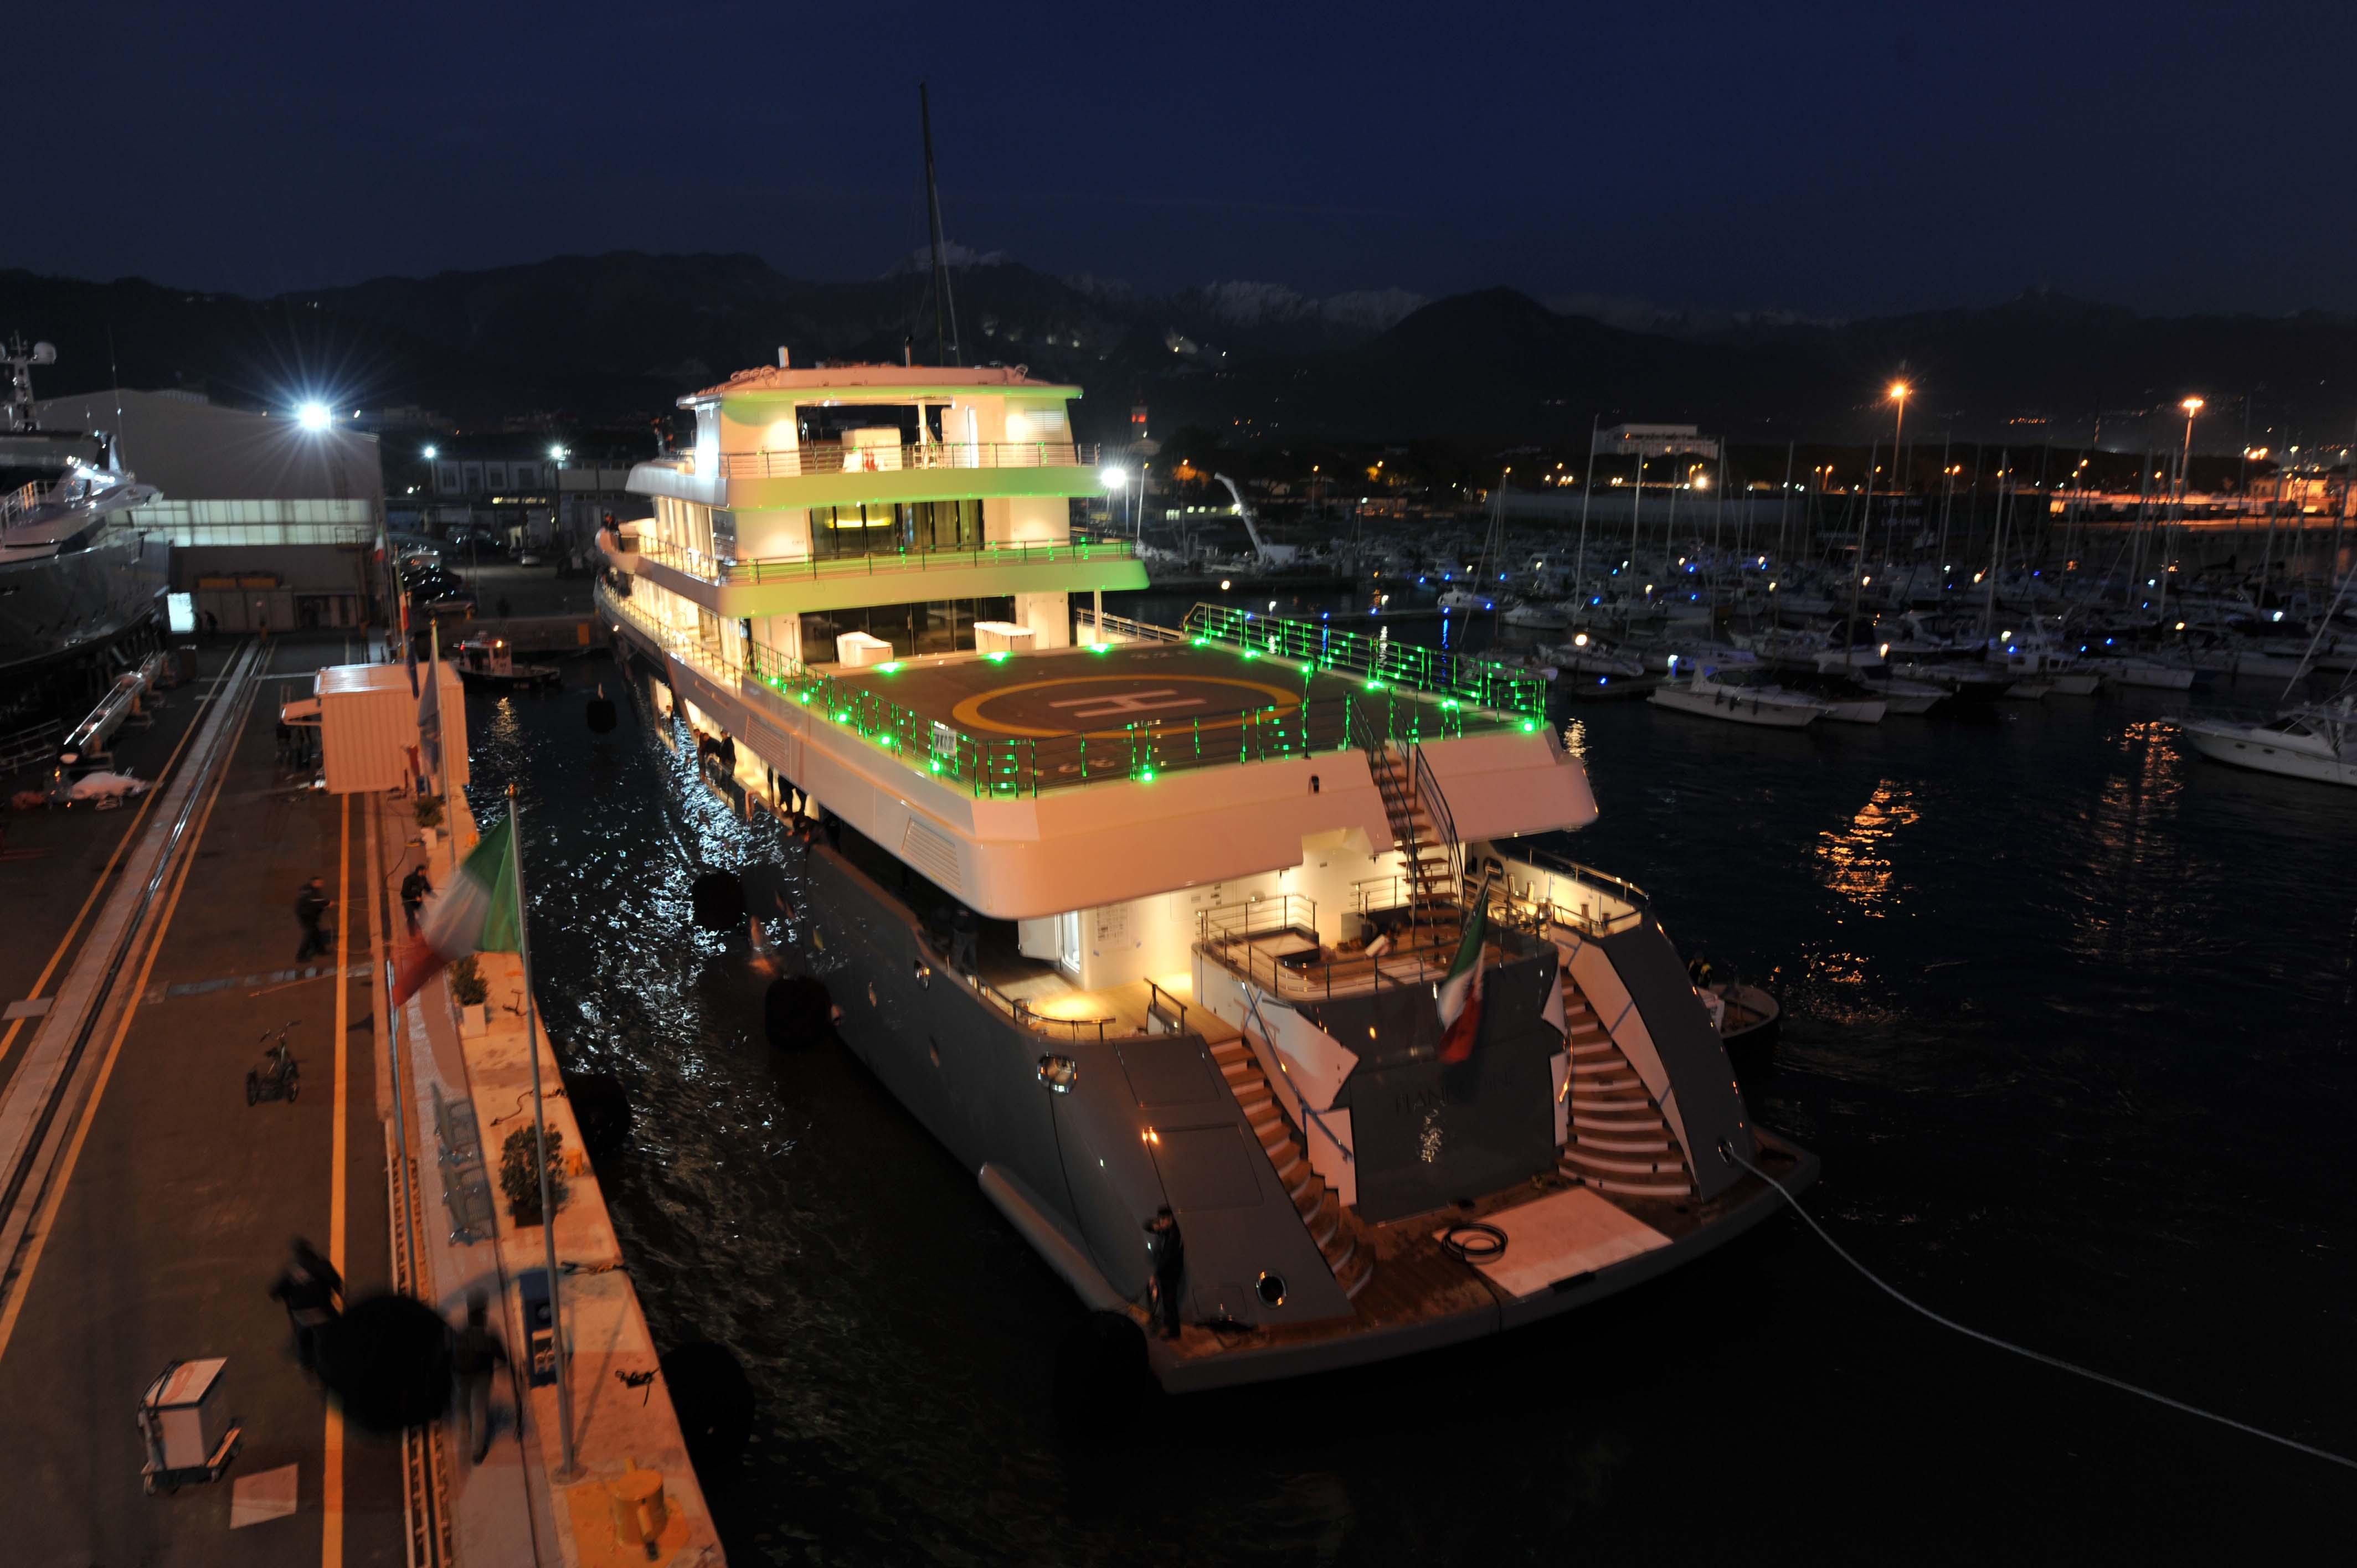 73m Explorer Yacht At Night